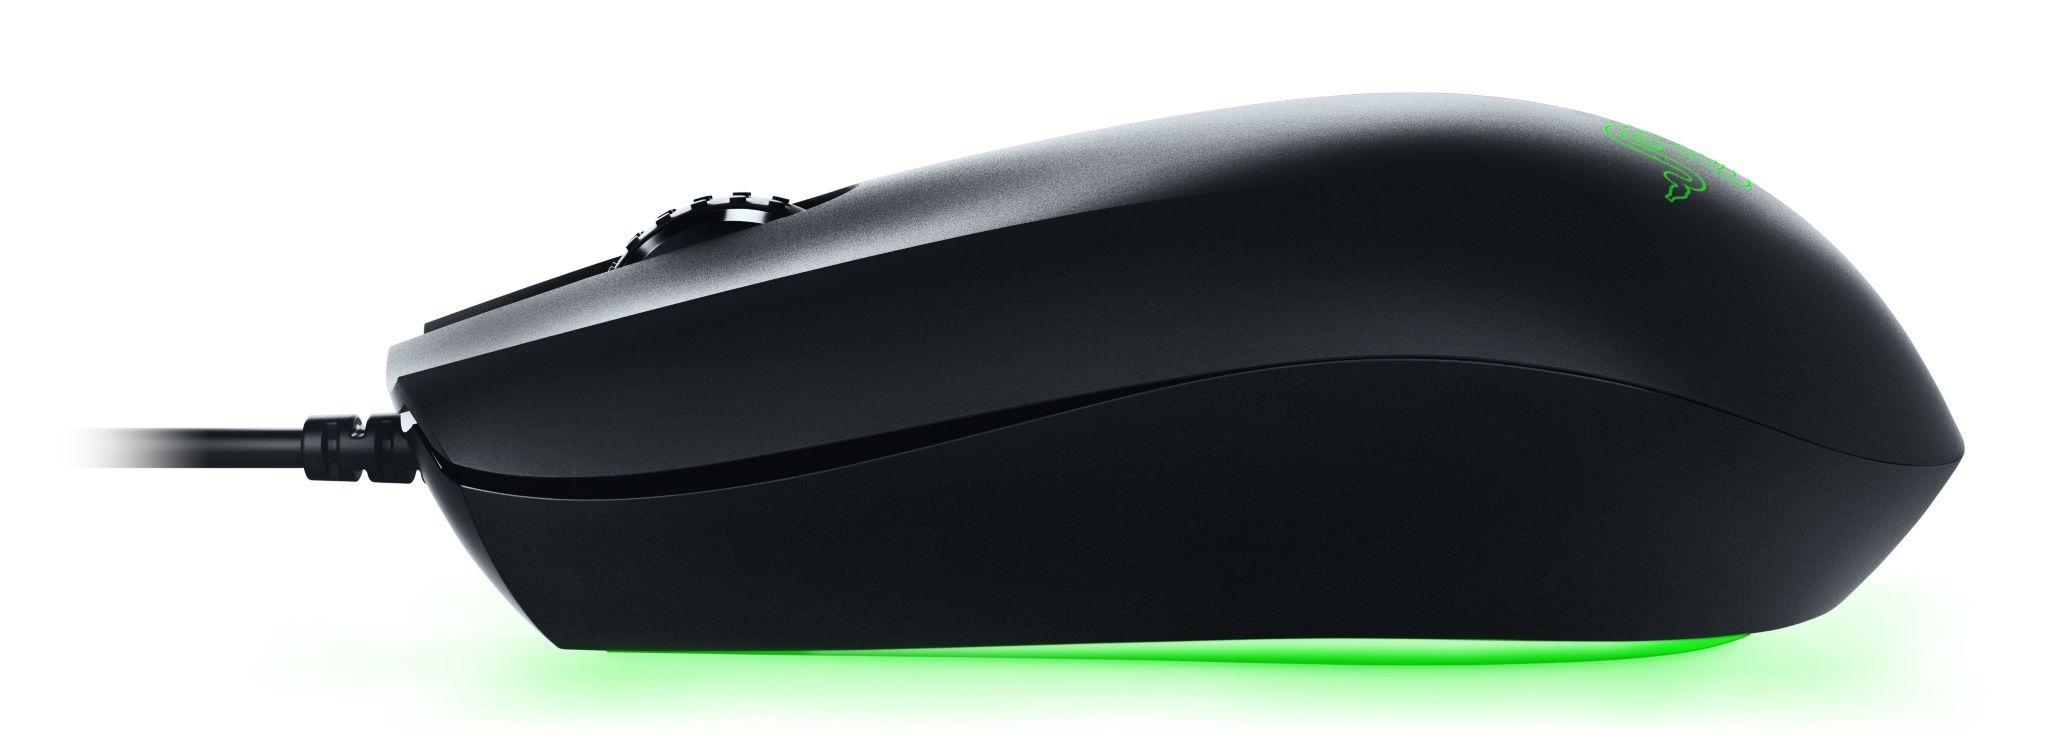 Гейминг мишка Razer Abyssus Essential - 3